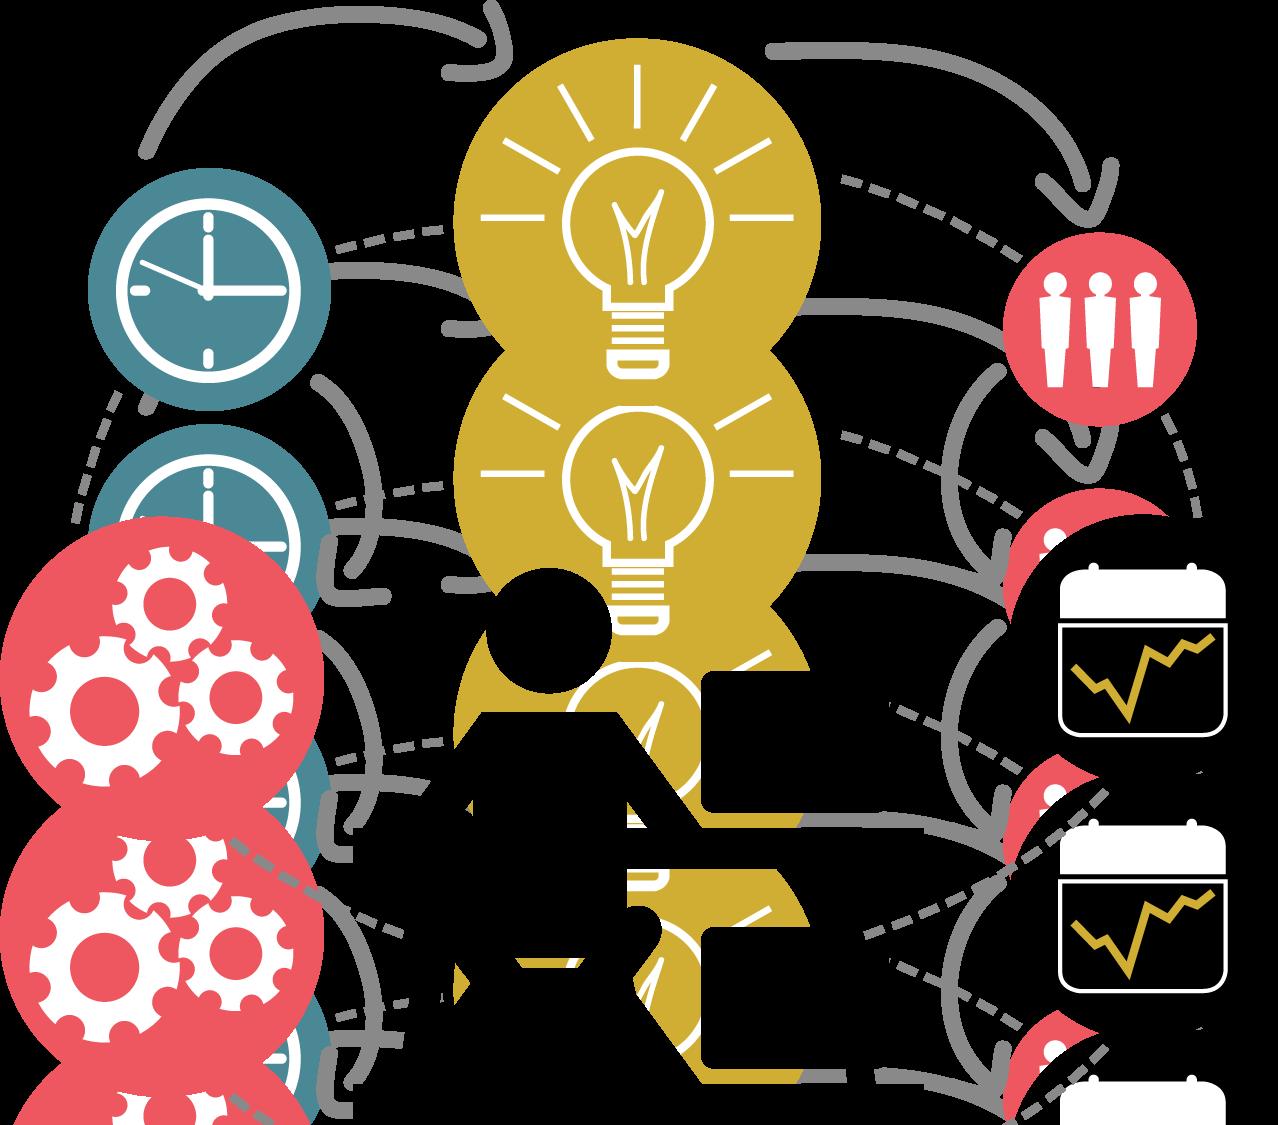 Plan clipart project planning. Management services